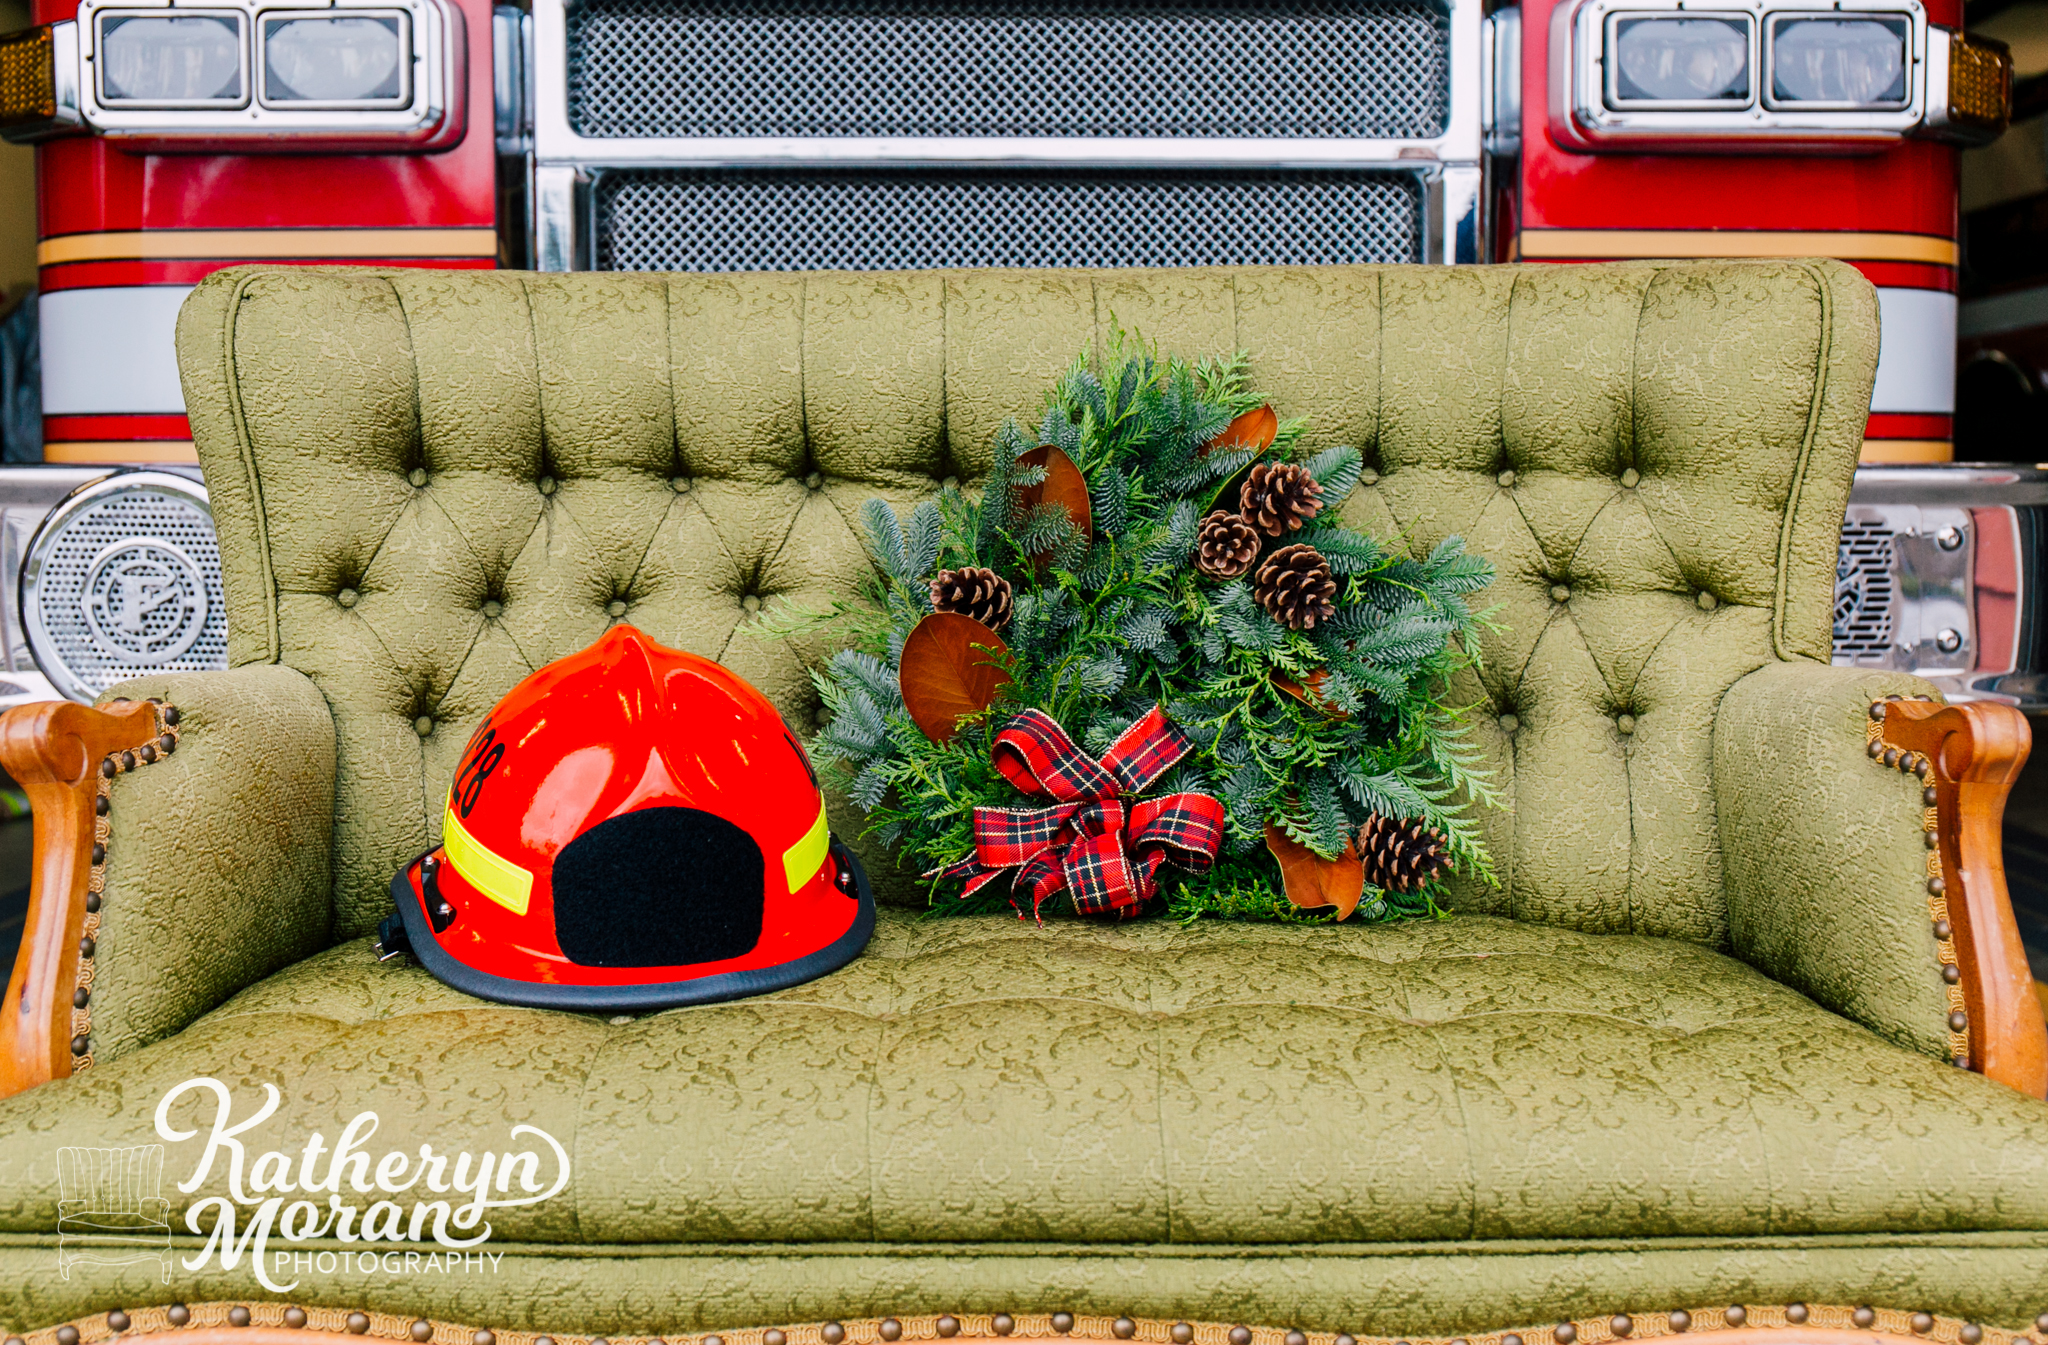 bellingham-photographer-katheryn-moran-whatcom-county-fire-station-12-help-holidays-2018-7.jpg